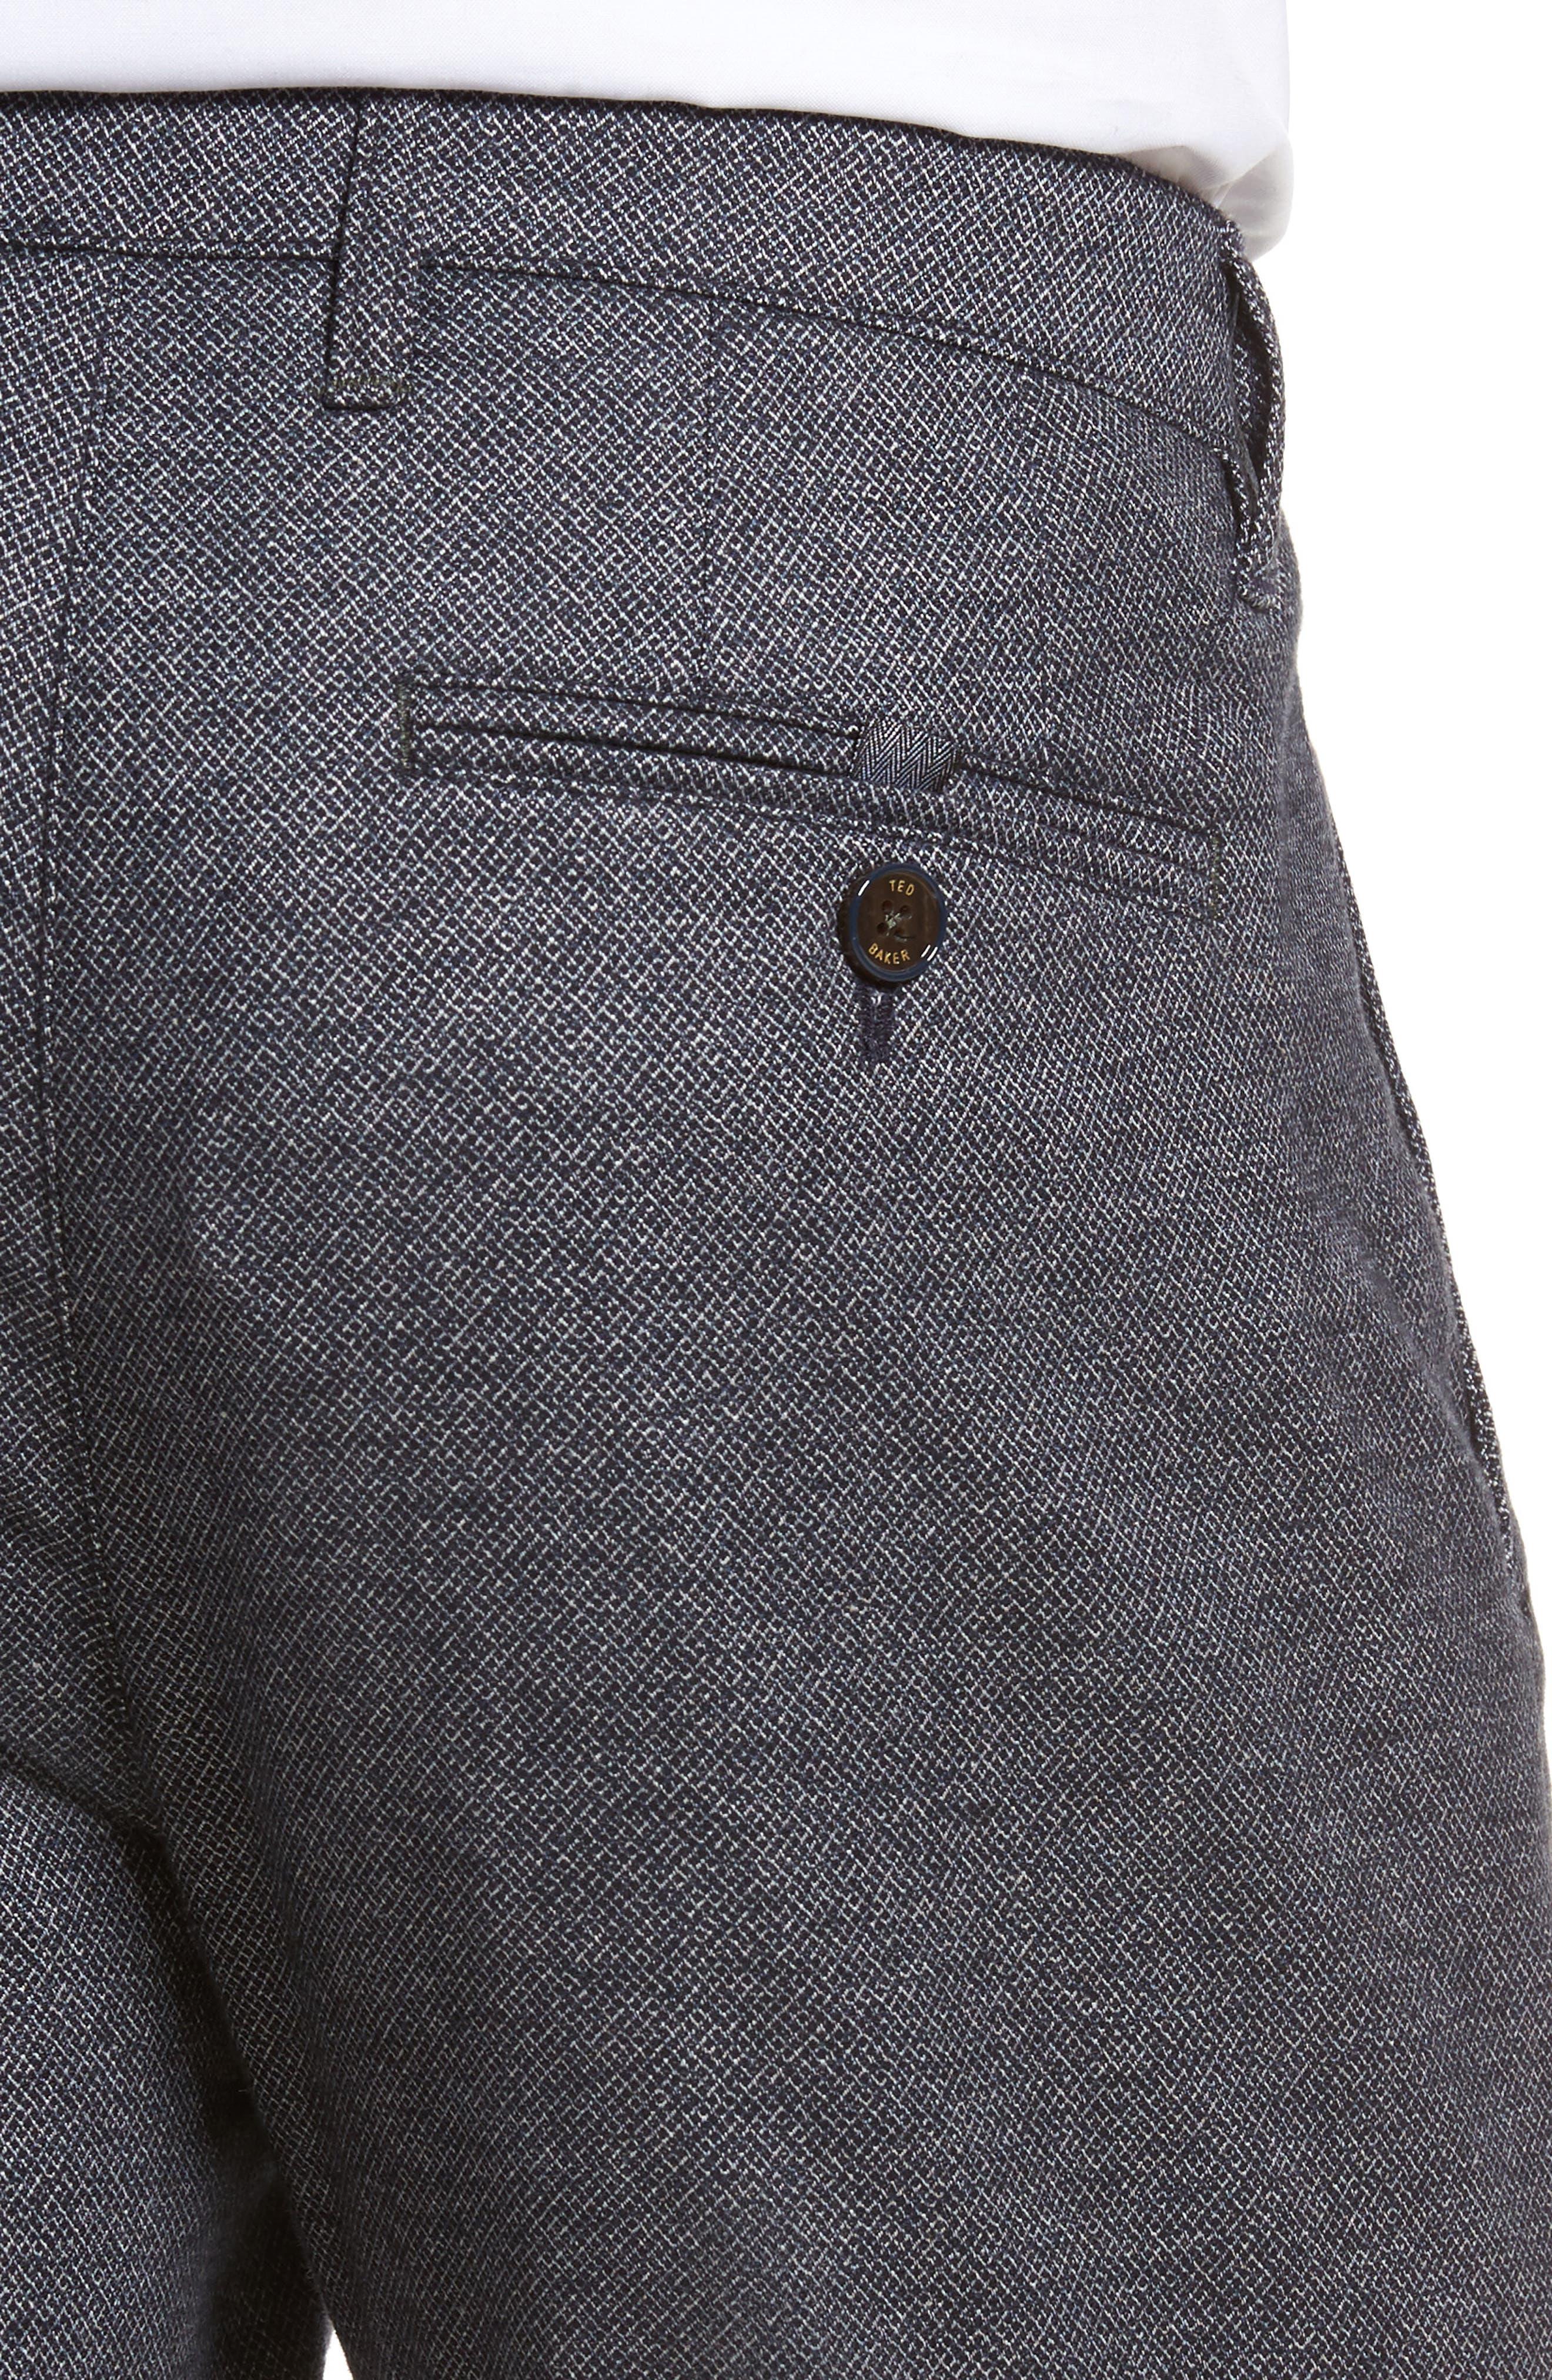 Pintztt Flat Front Stretch Solid Cotton Pants,                             Alternate thumbnail 4, color,                             Navy